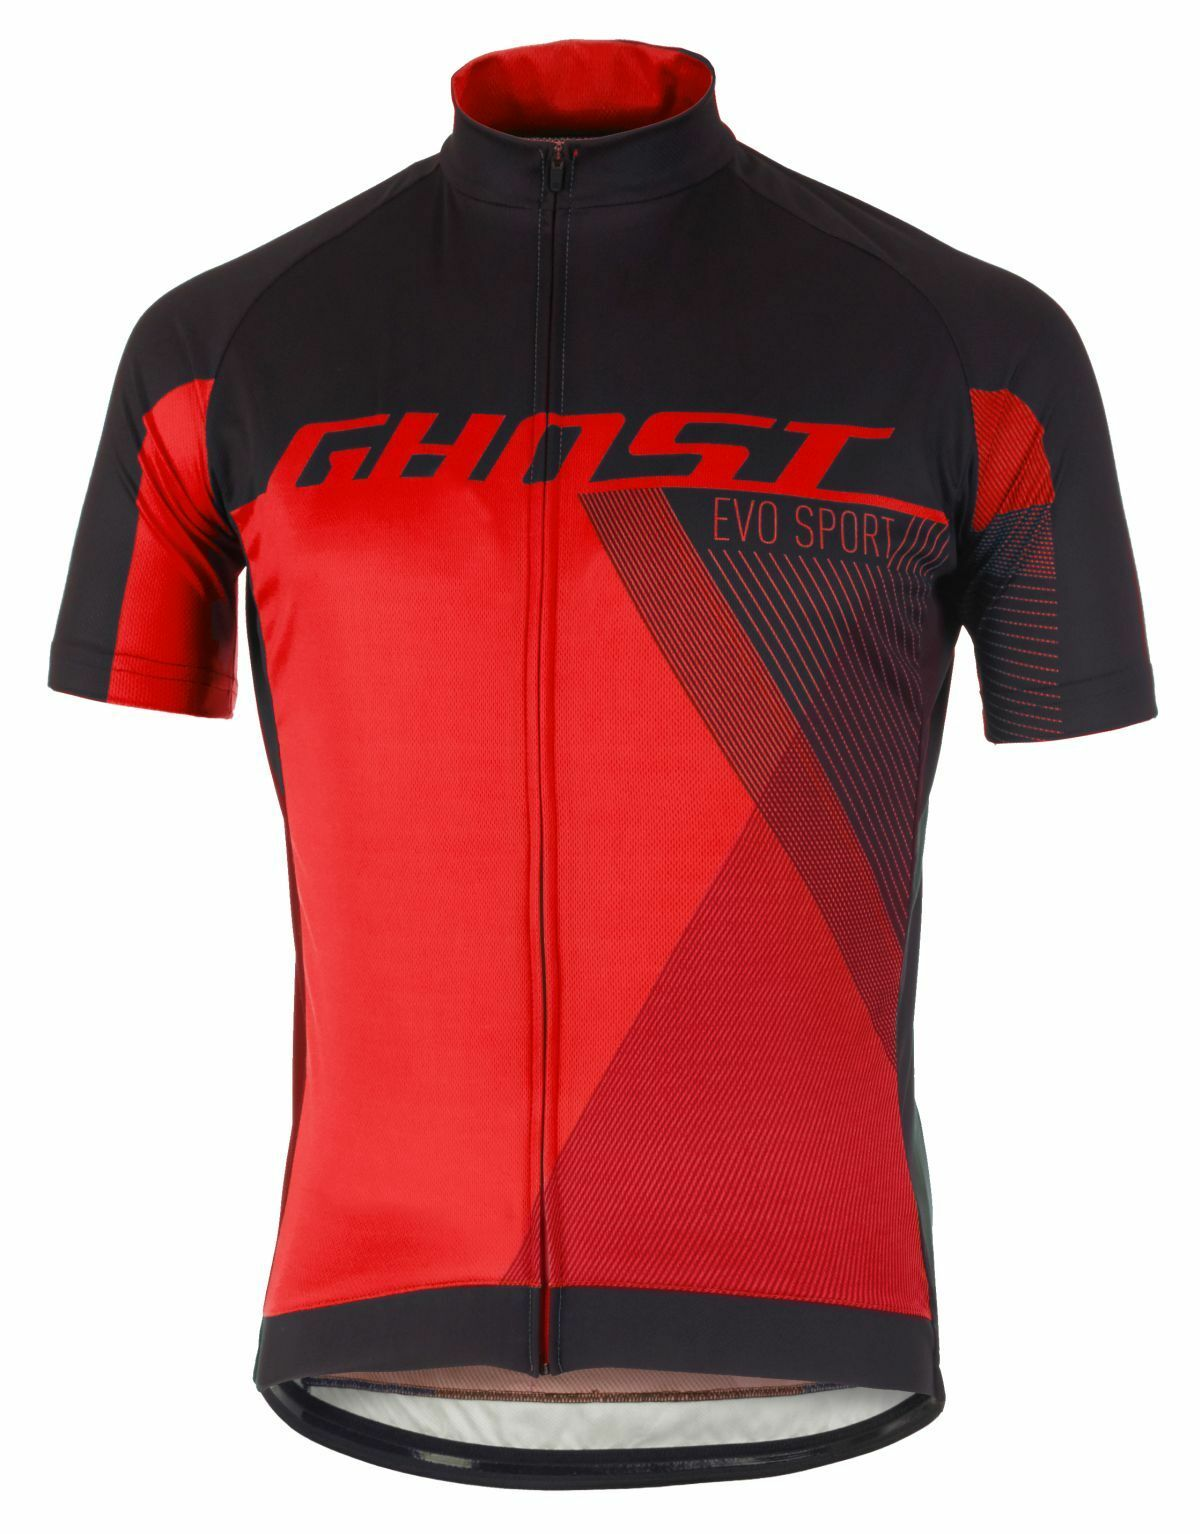 Ghost Performance Evo Jersey Short, black-red, Größe XXL, Fahrrad-Trikot